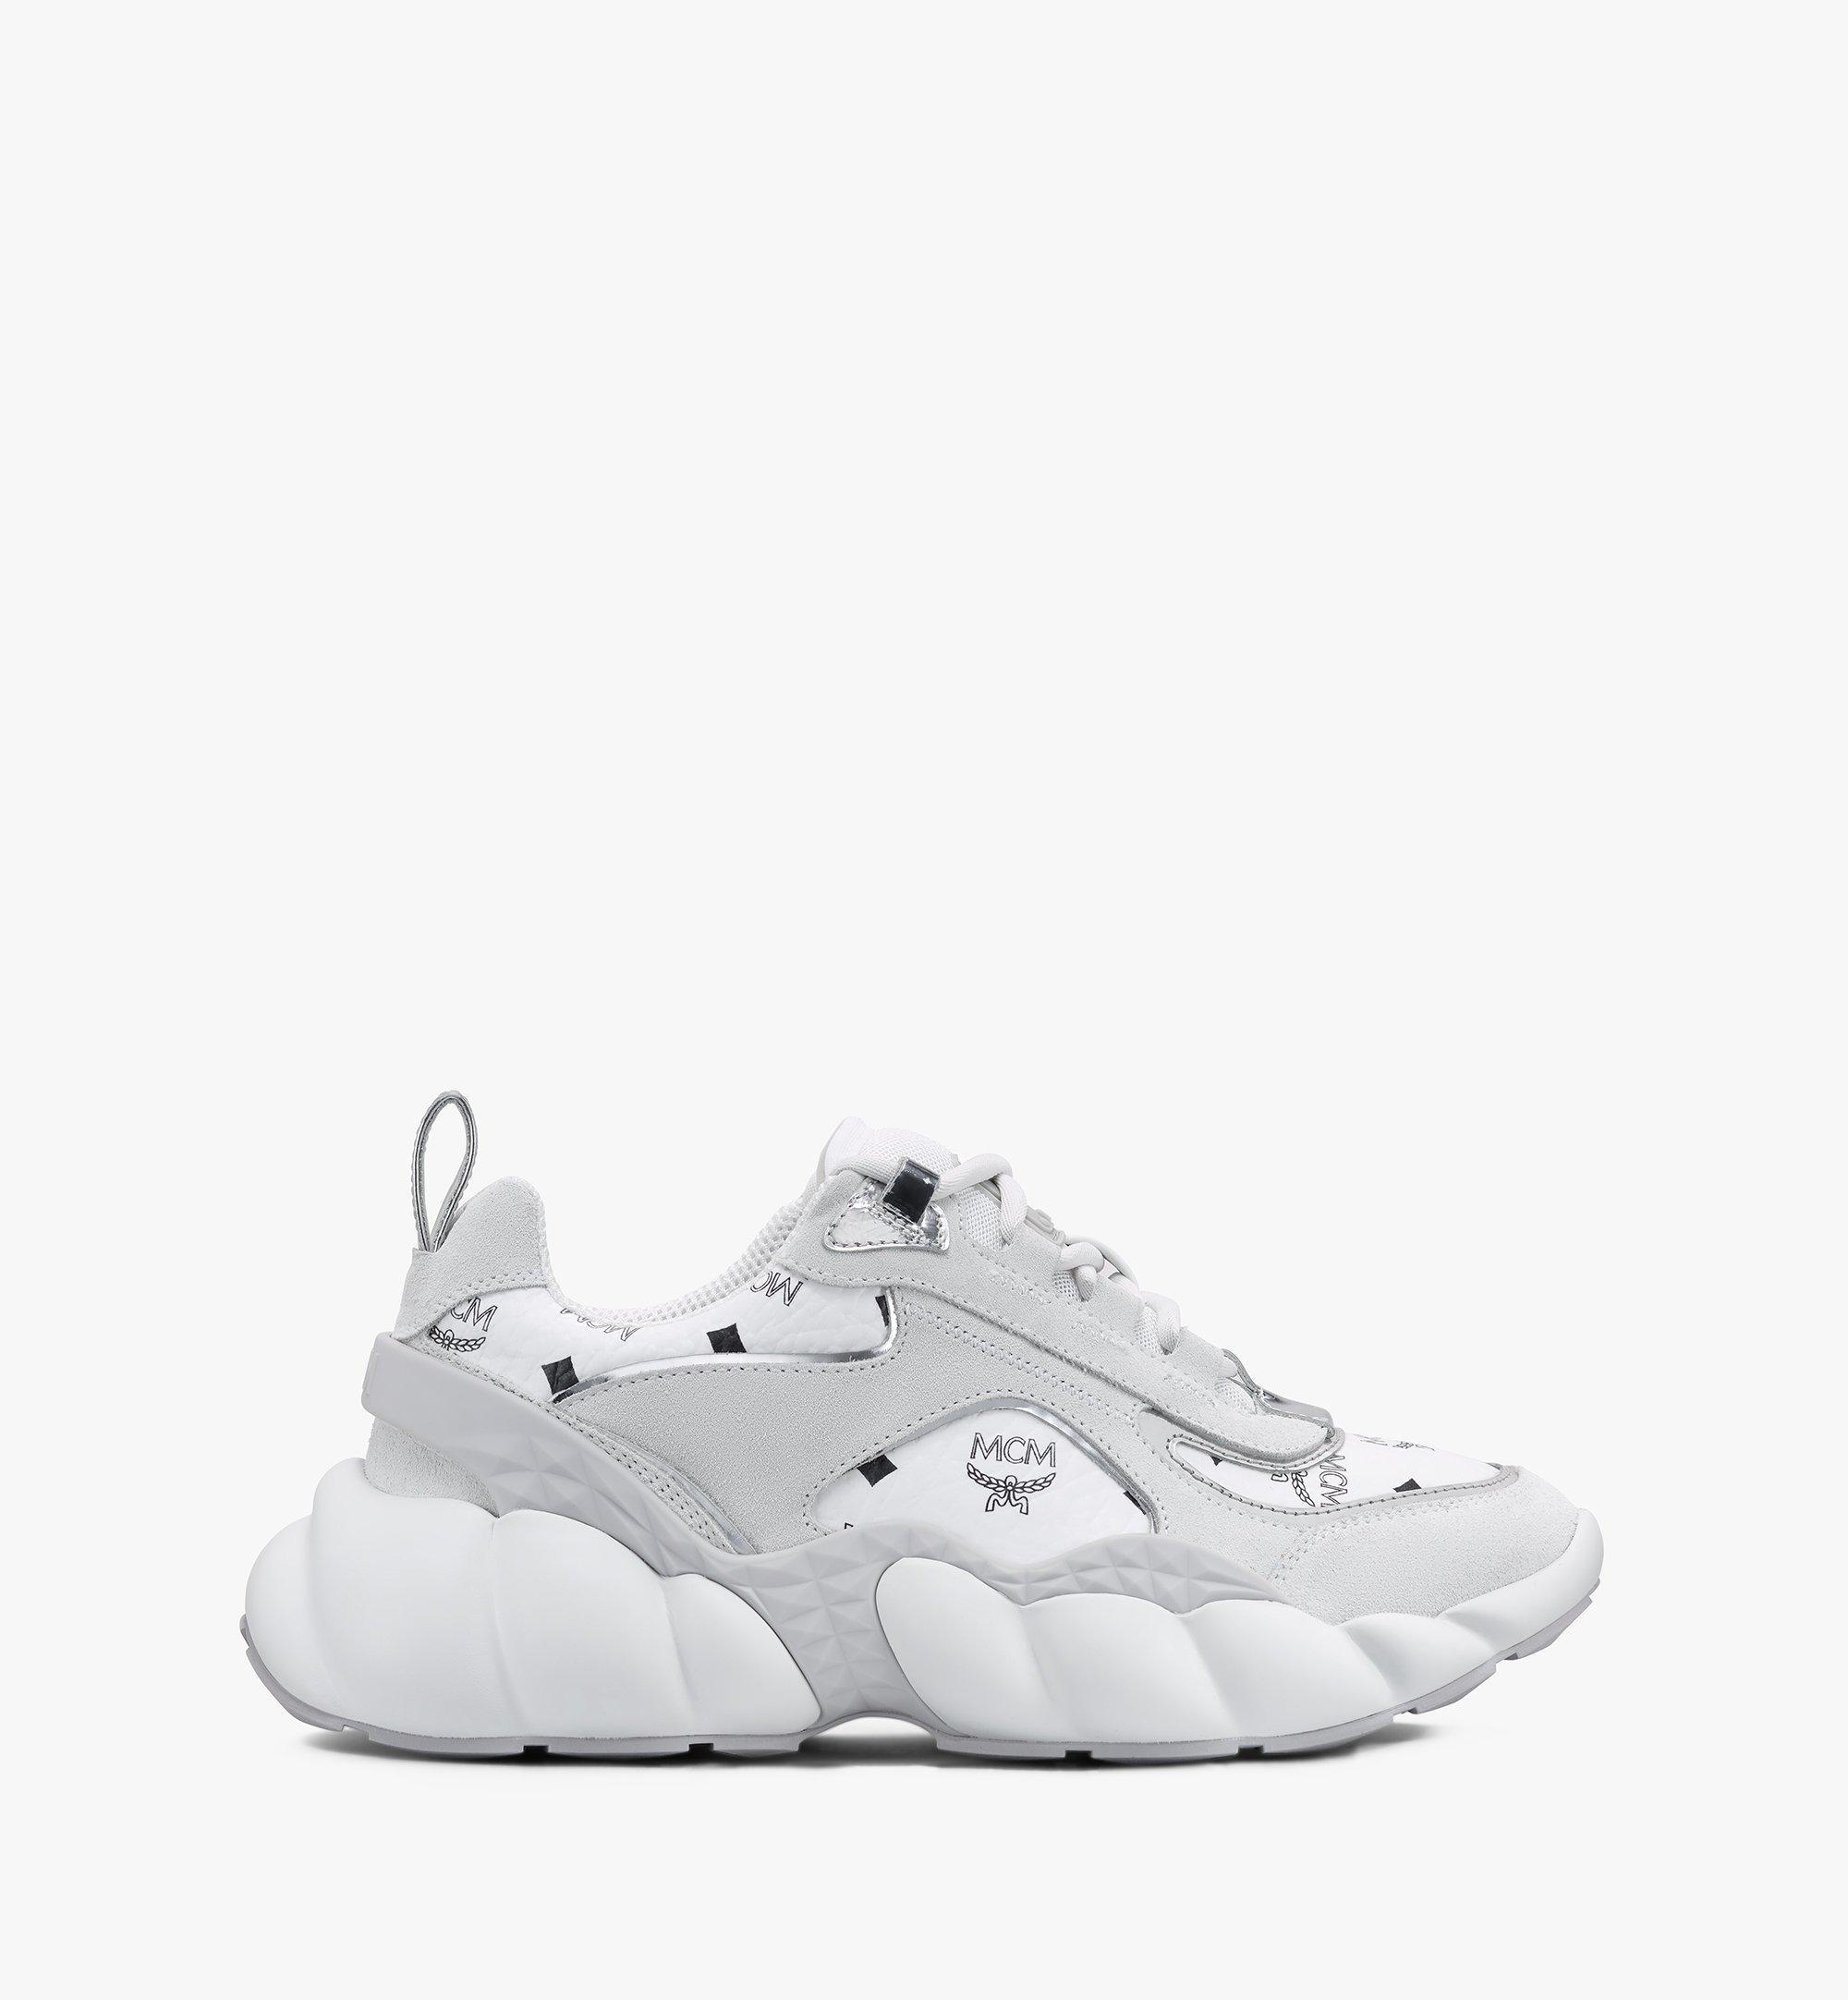 MCM Women's Himmel Low-Top Sneakers in Visetos White MESASNX05WT037 Alternate View 1